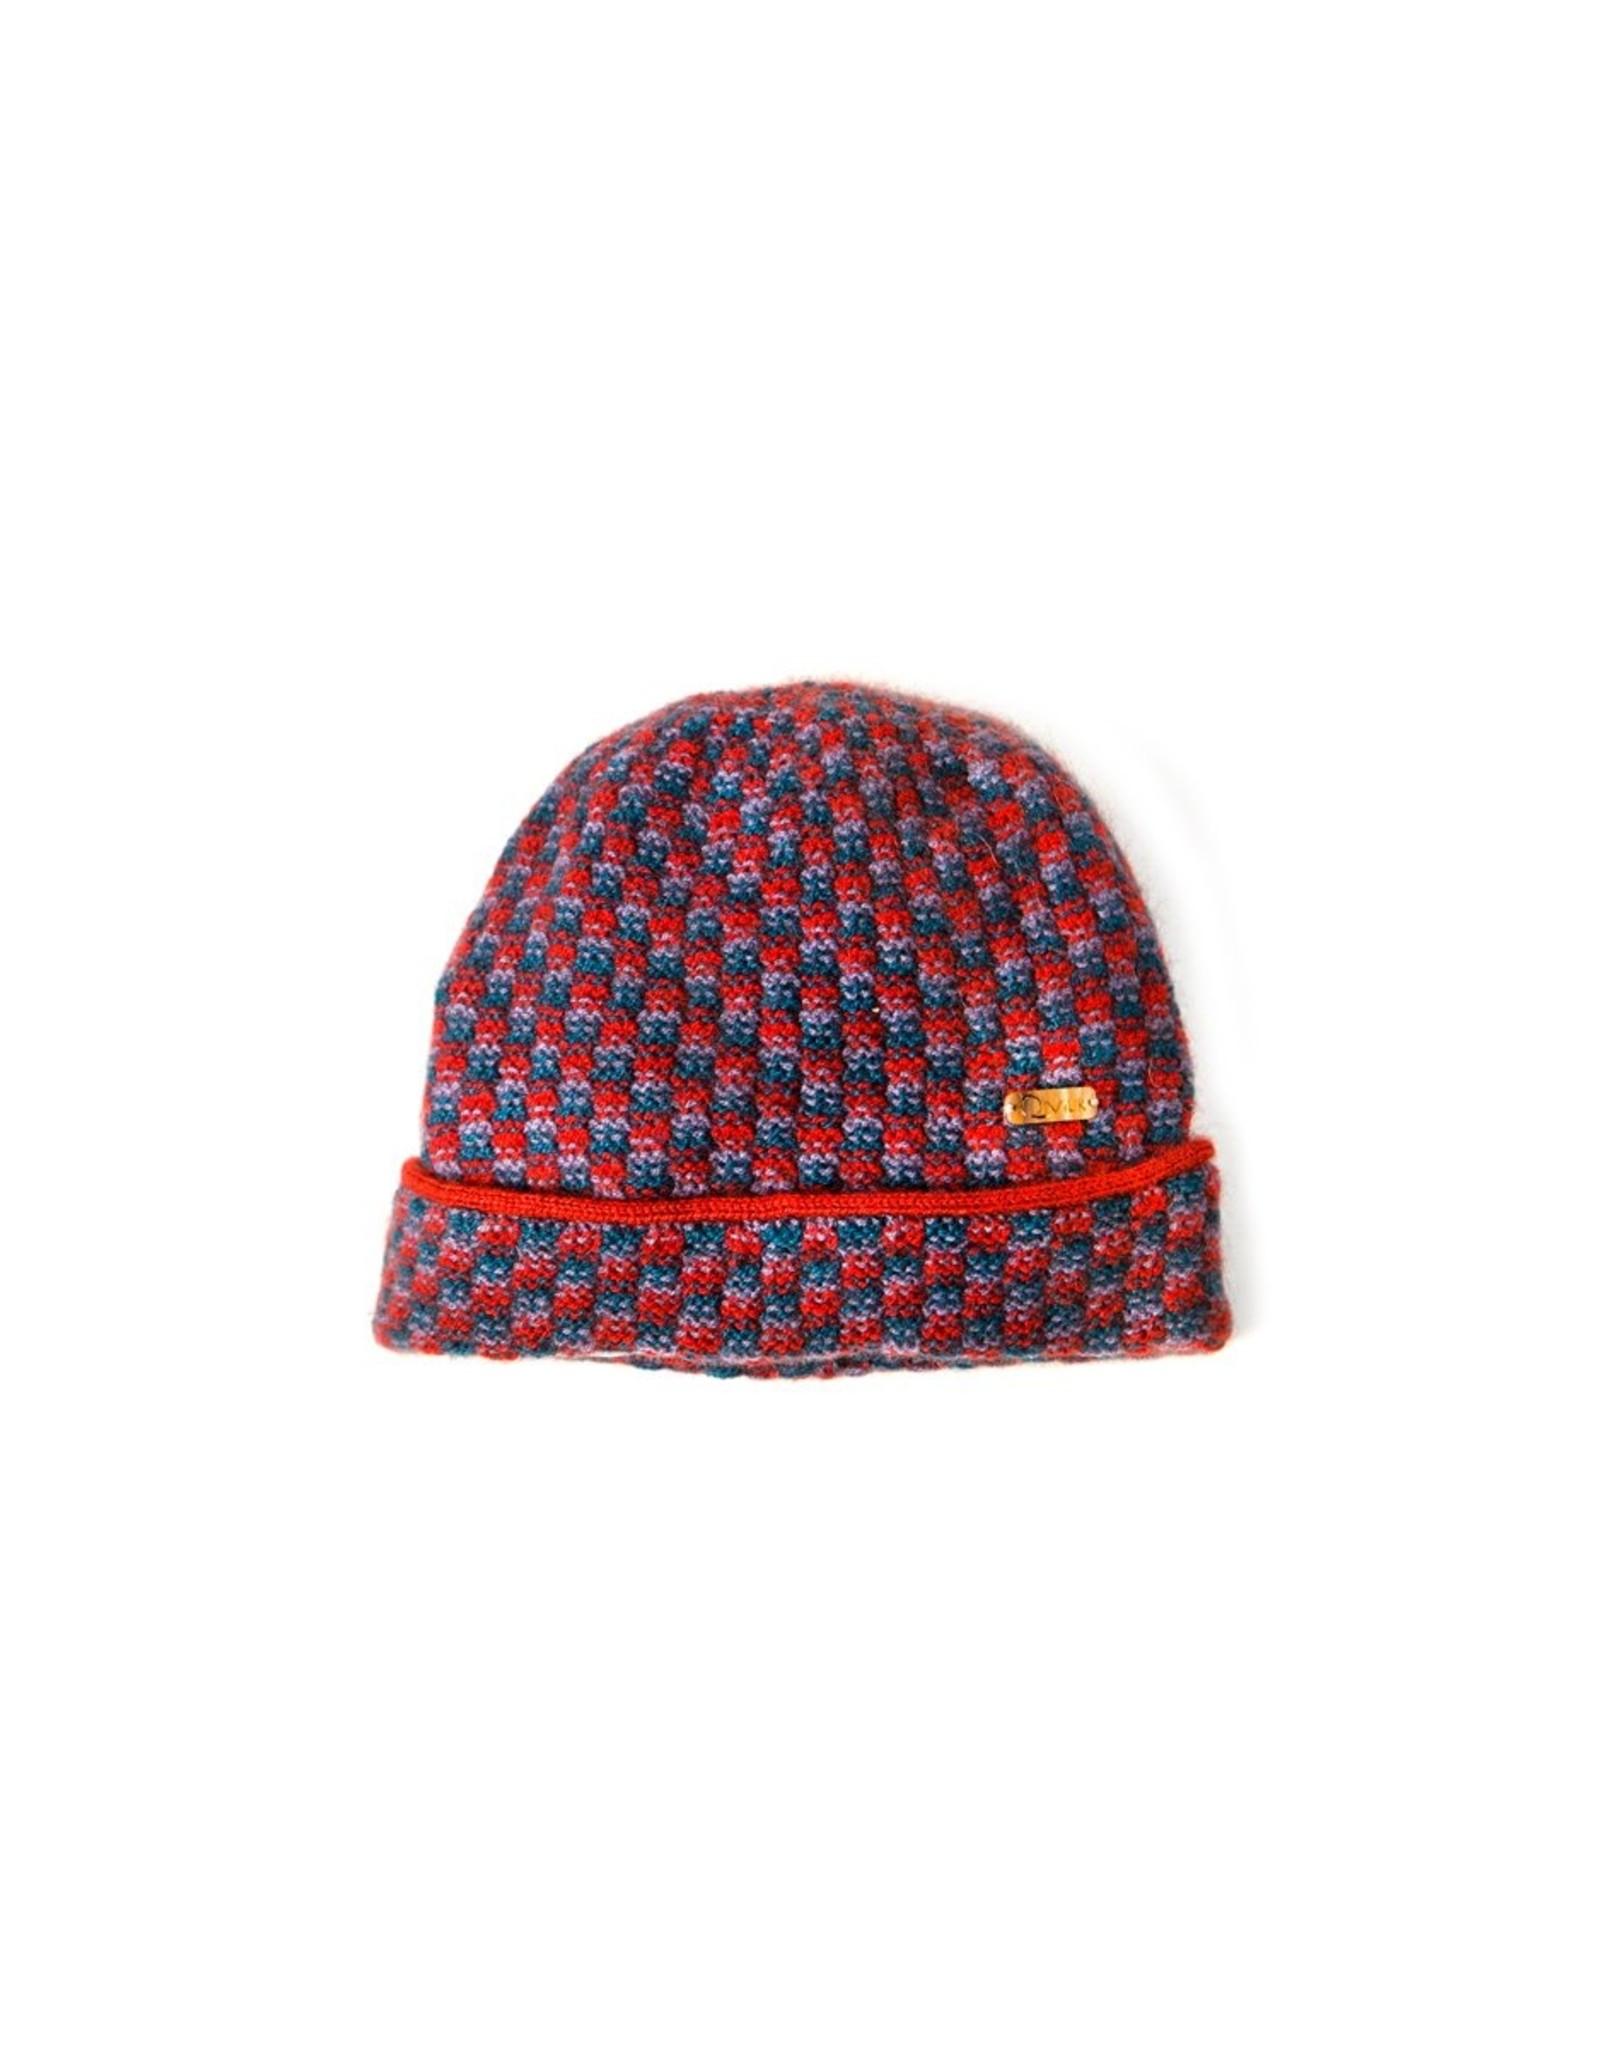 Melody Hat - 45% Qiviuk 45% Merino 10% Silk